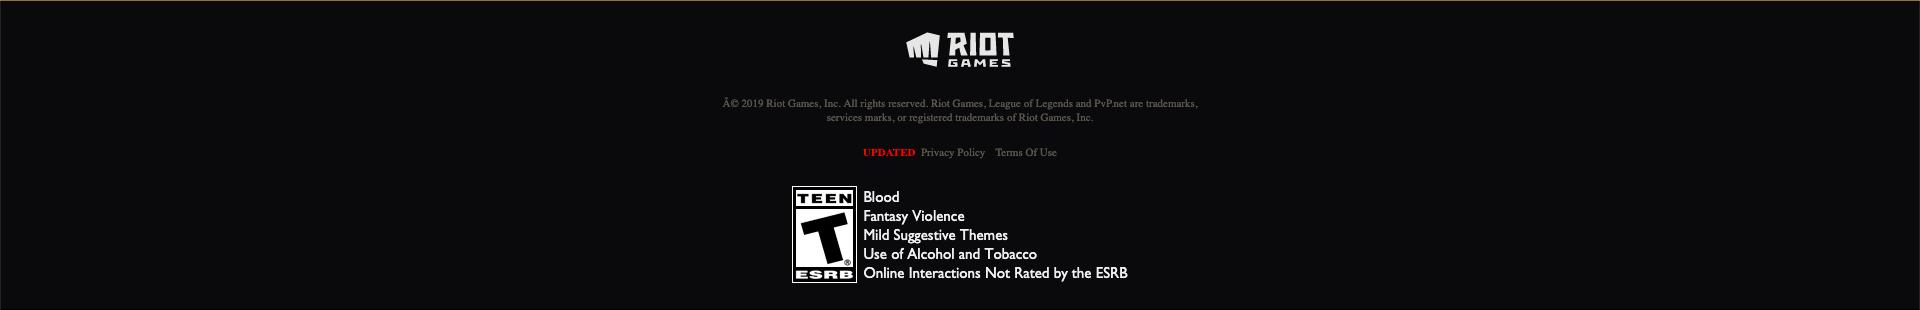 Tilt Types - Riot Games Player Support